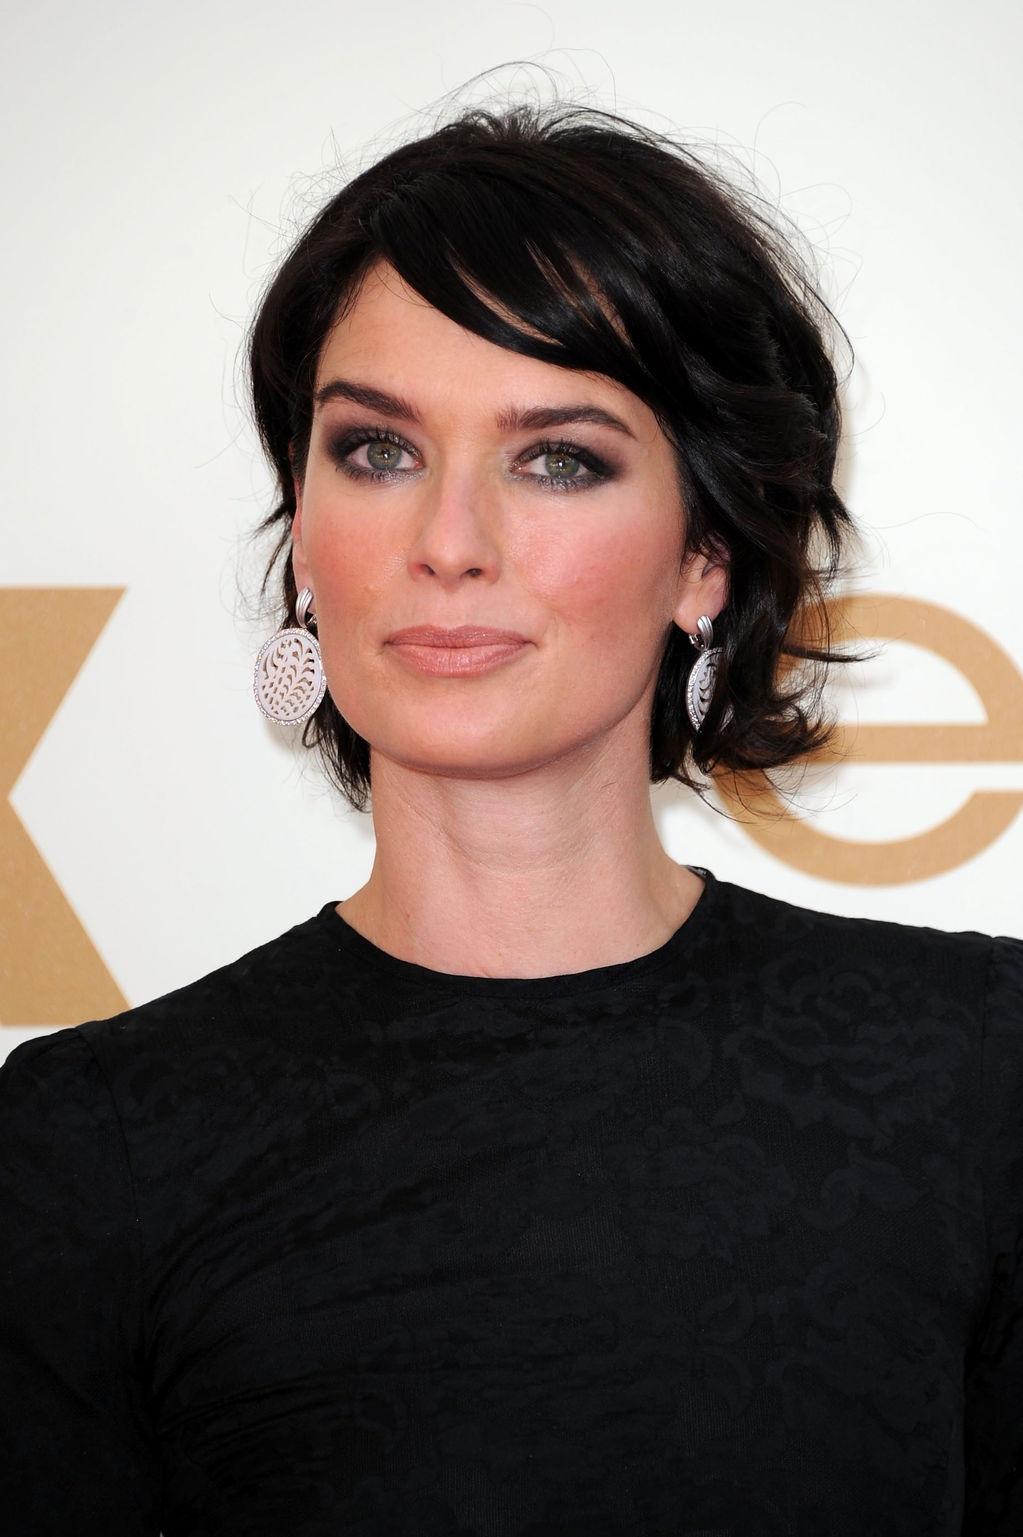 Lena_Headey_Primetime_Emmy_Awards_2014